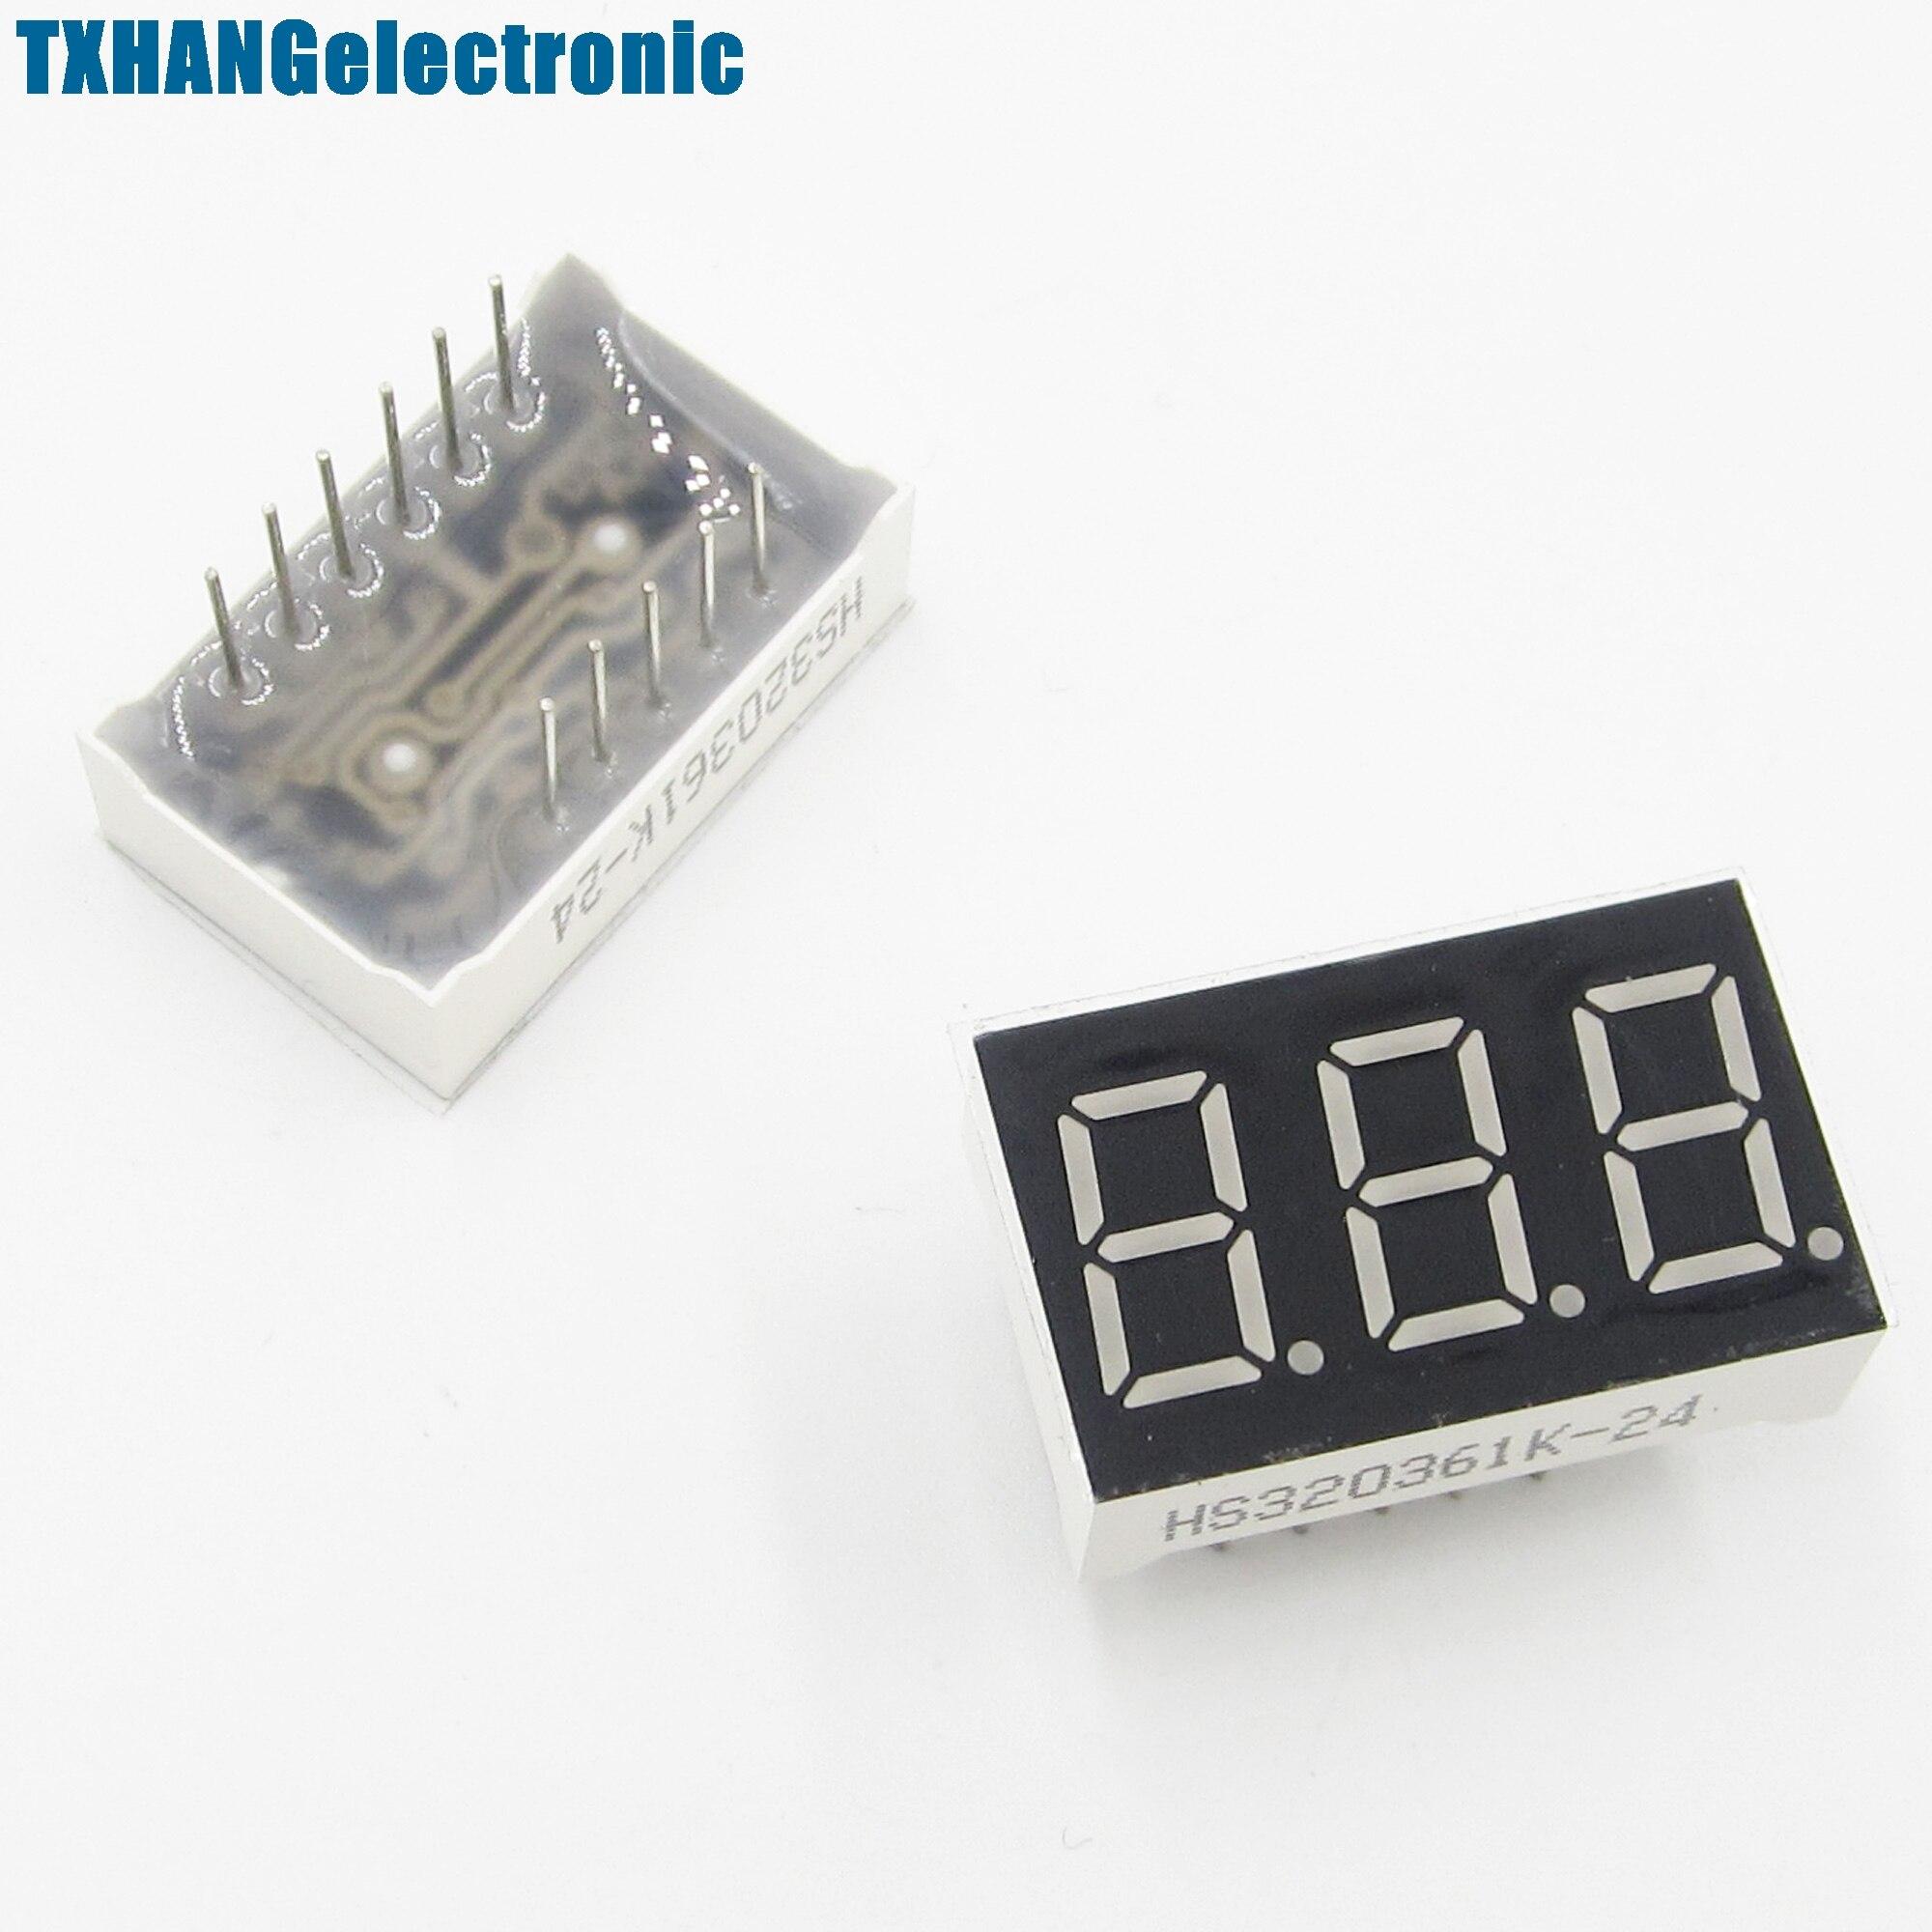 2PCS 0.56 Inch 3 Digit 7 Segment Common Cathode Red Led Display diy electronics